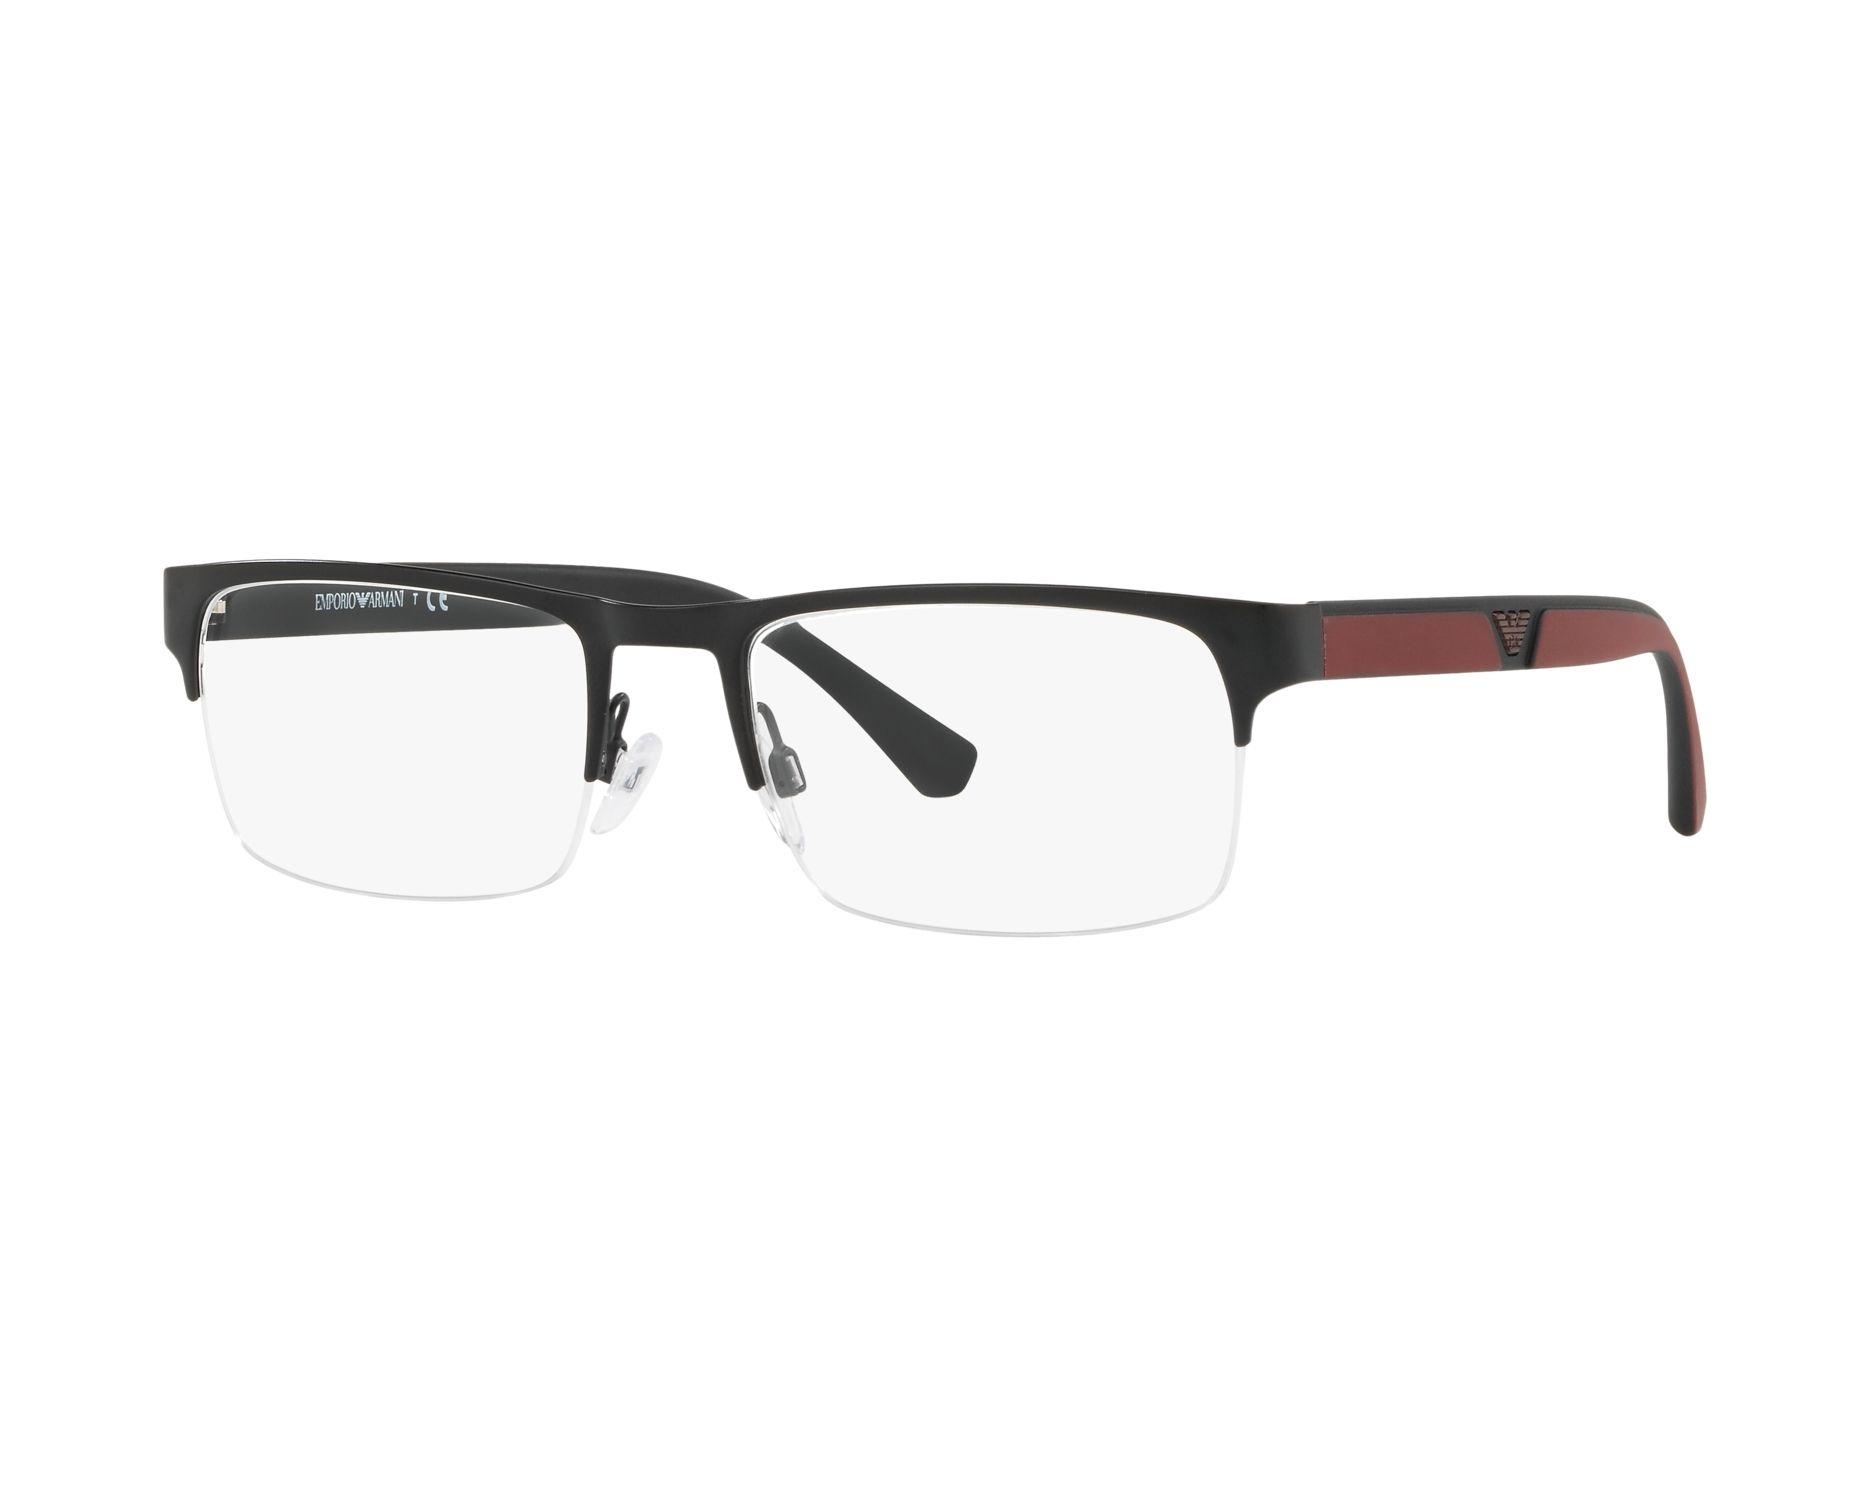 cf7e6eca31 eyeglasses Emporio Armani EA-1072 3001 55-19 Black Bordeaux